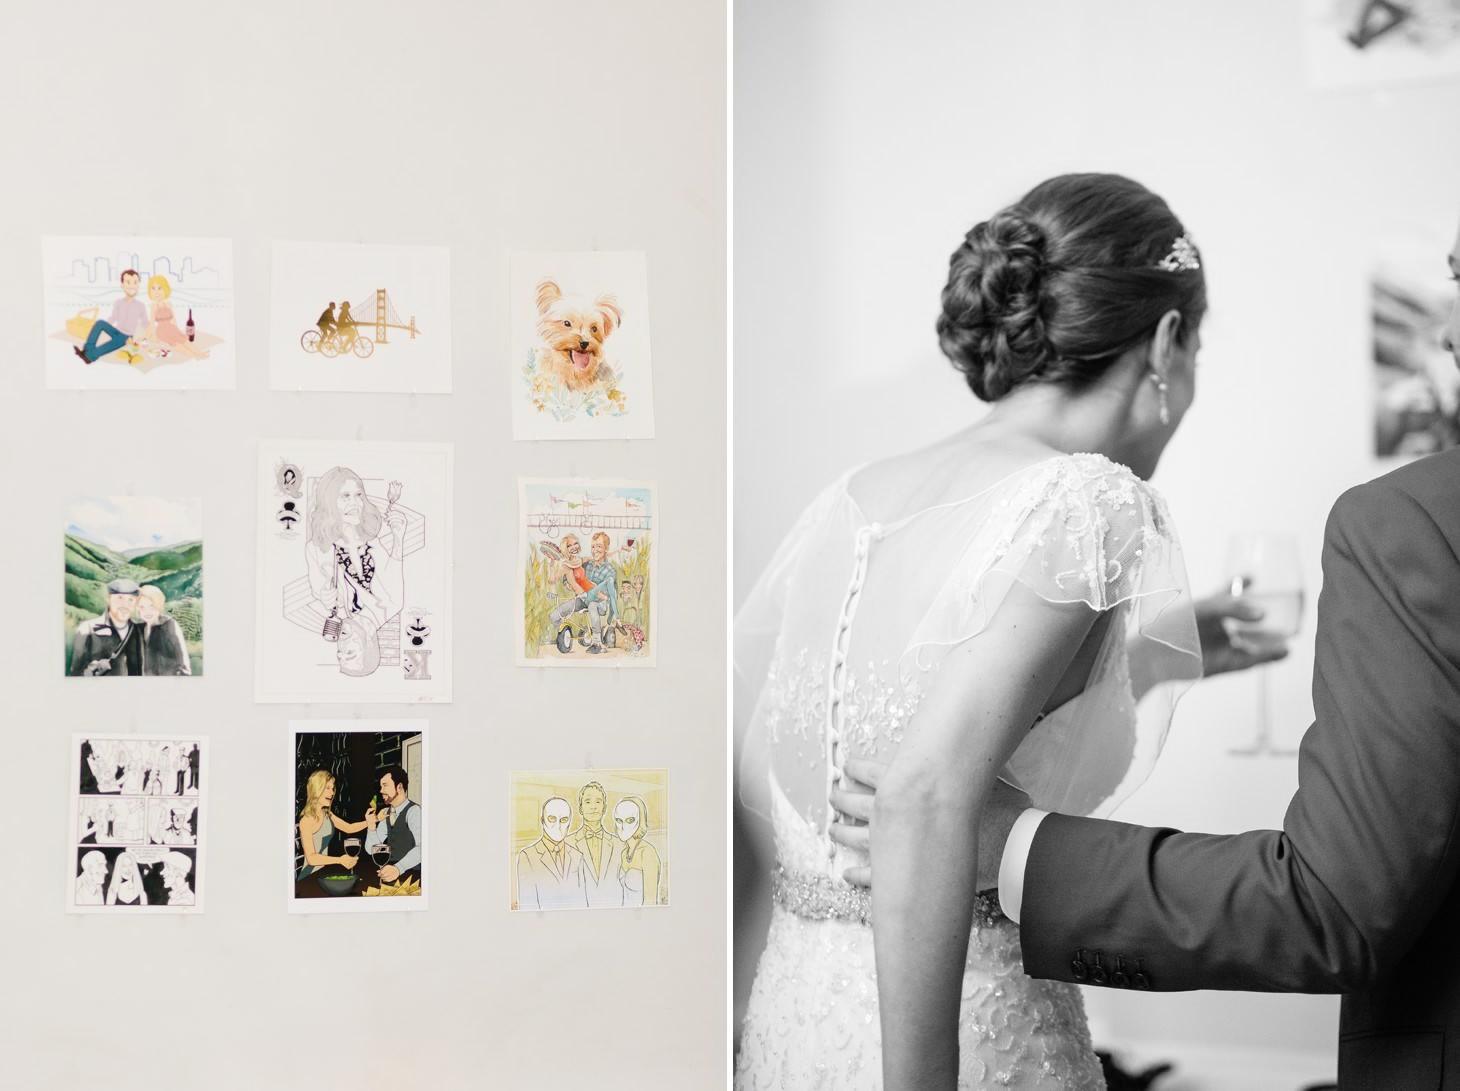 x-brooklyn-restaurant-wedding-nyc-weddingi-photographer-smitten-chickens182.jpg